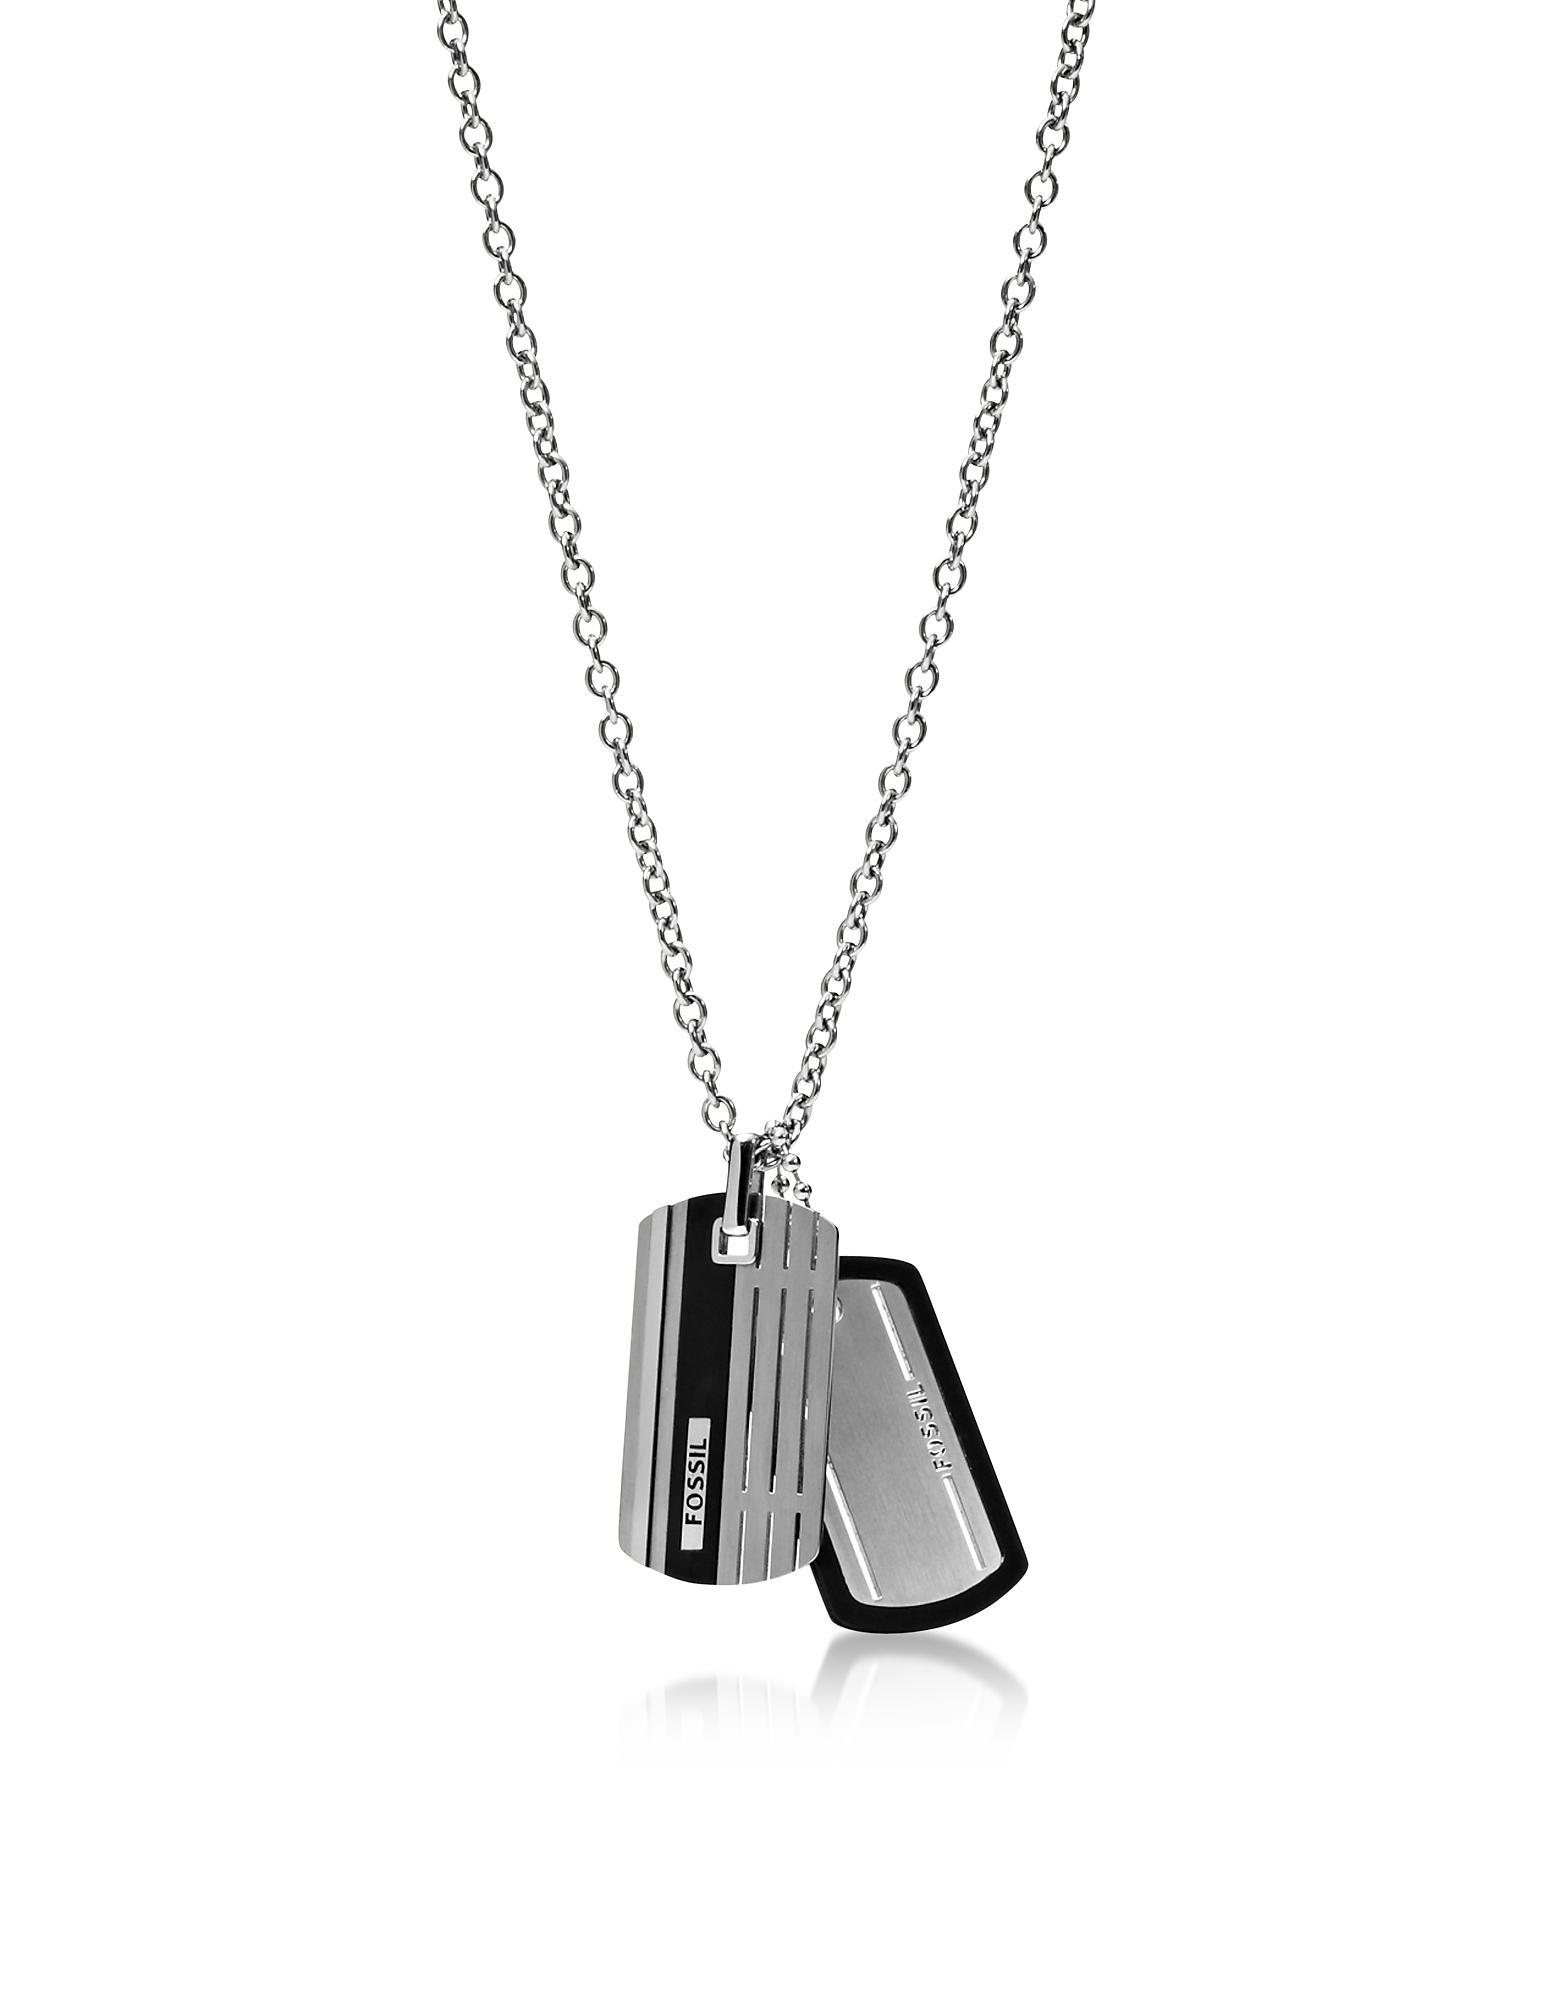 ID Tag Men's Necklace